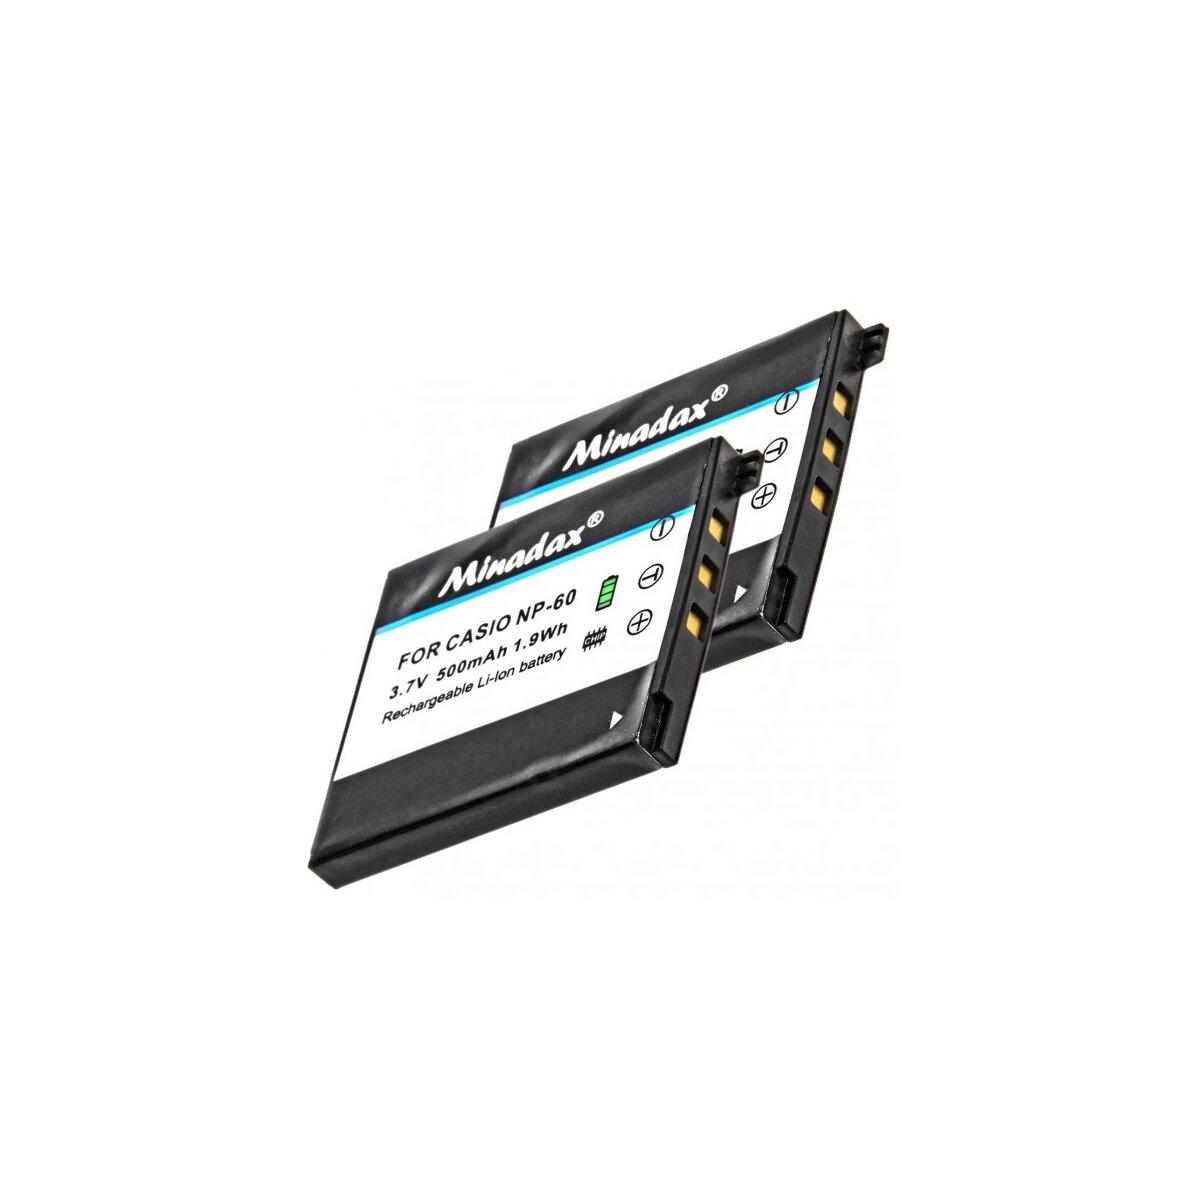 2x Minadax Qualitätsakku mit echten 500 mAh kompatibel für Casio Exilim EX-FS10, EX-S10, EX-S12, EX-Z9, EX-Z21, EX-Z20, EX-Z25, EX-Z80, EX-Z90, Ersatz für NP-60